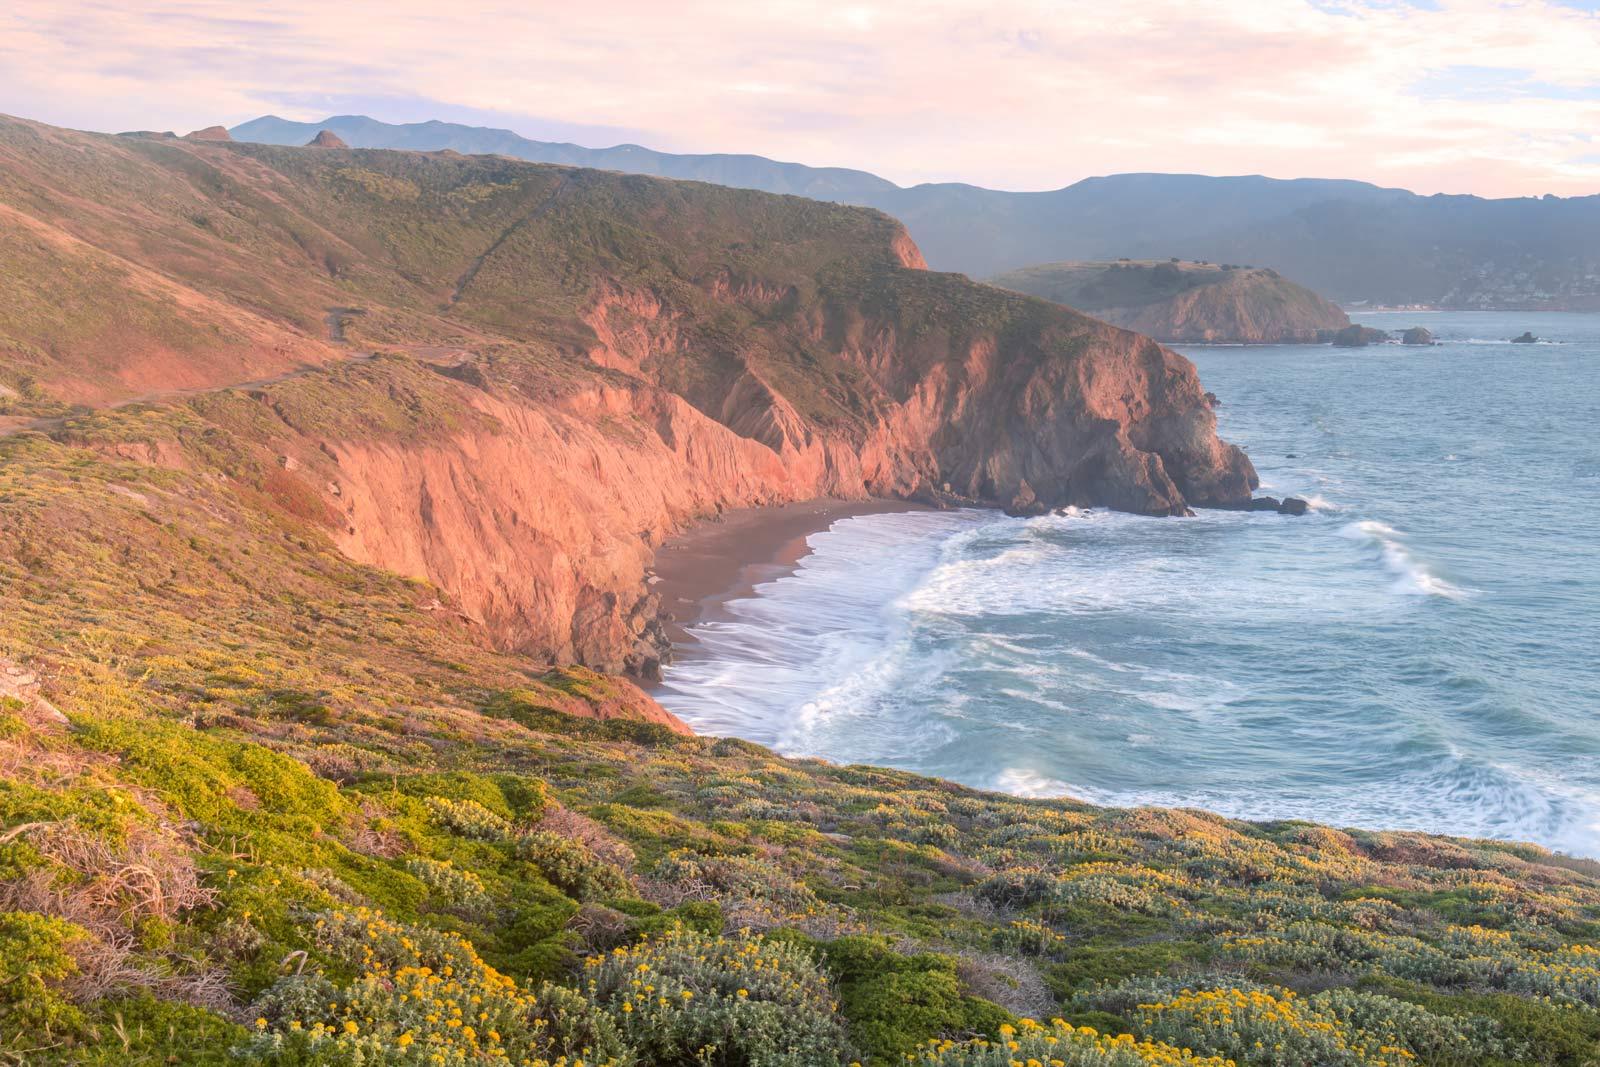 Mori Point Pacifica near San Francisco